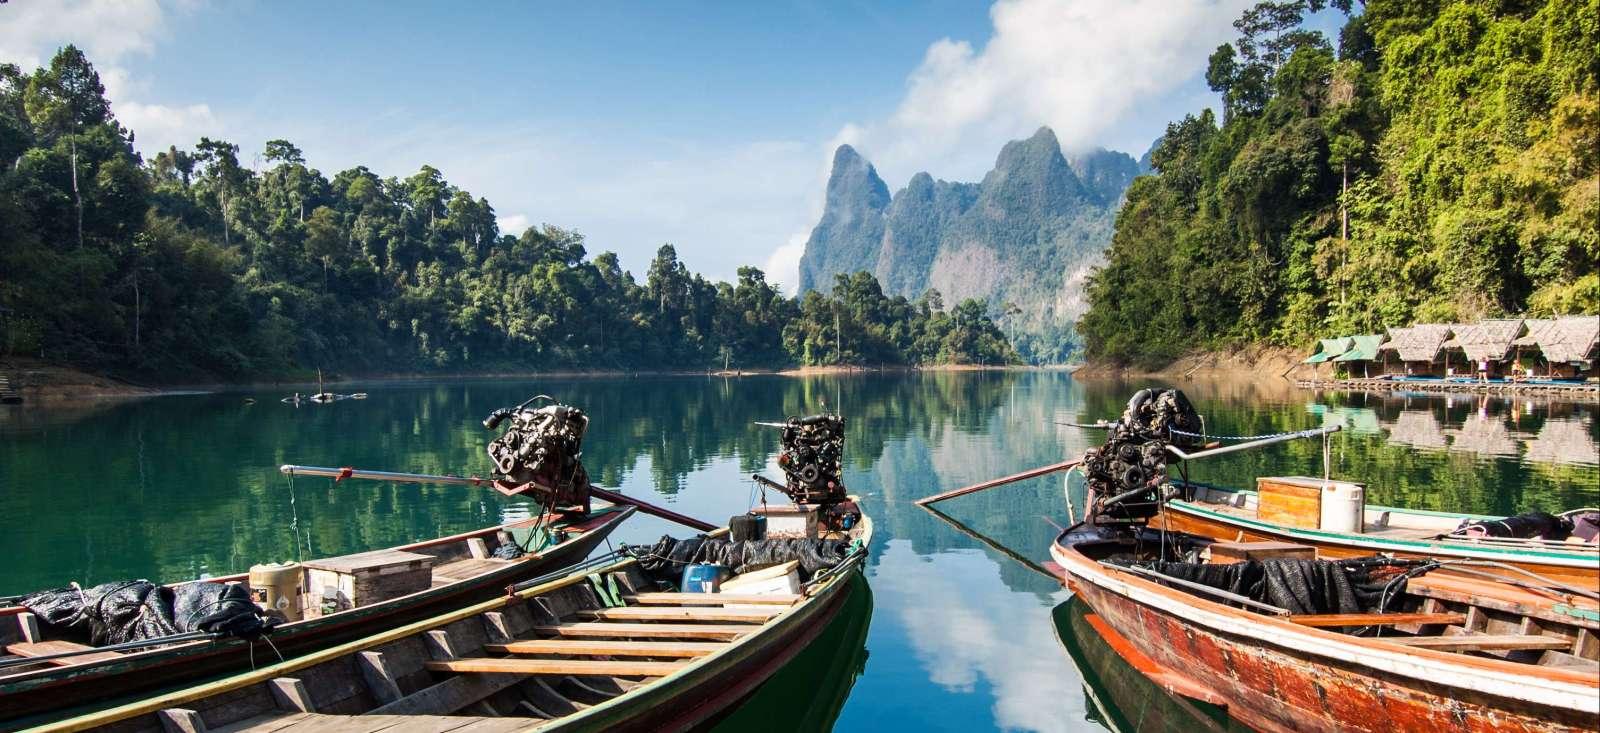 Voyage à pied : Escapade au royaume de Siam